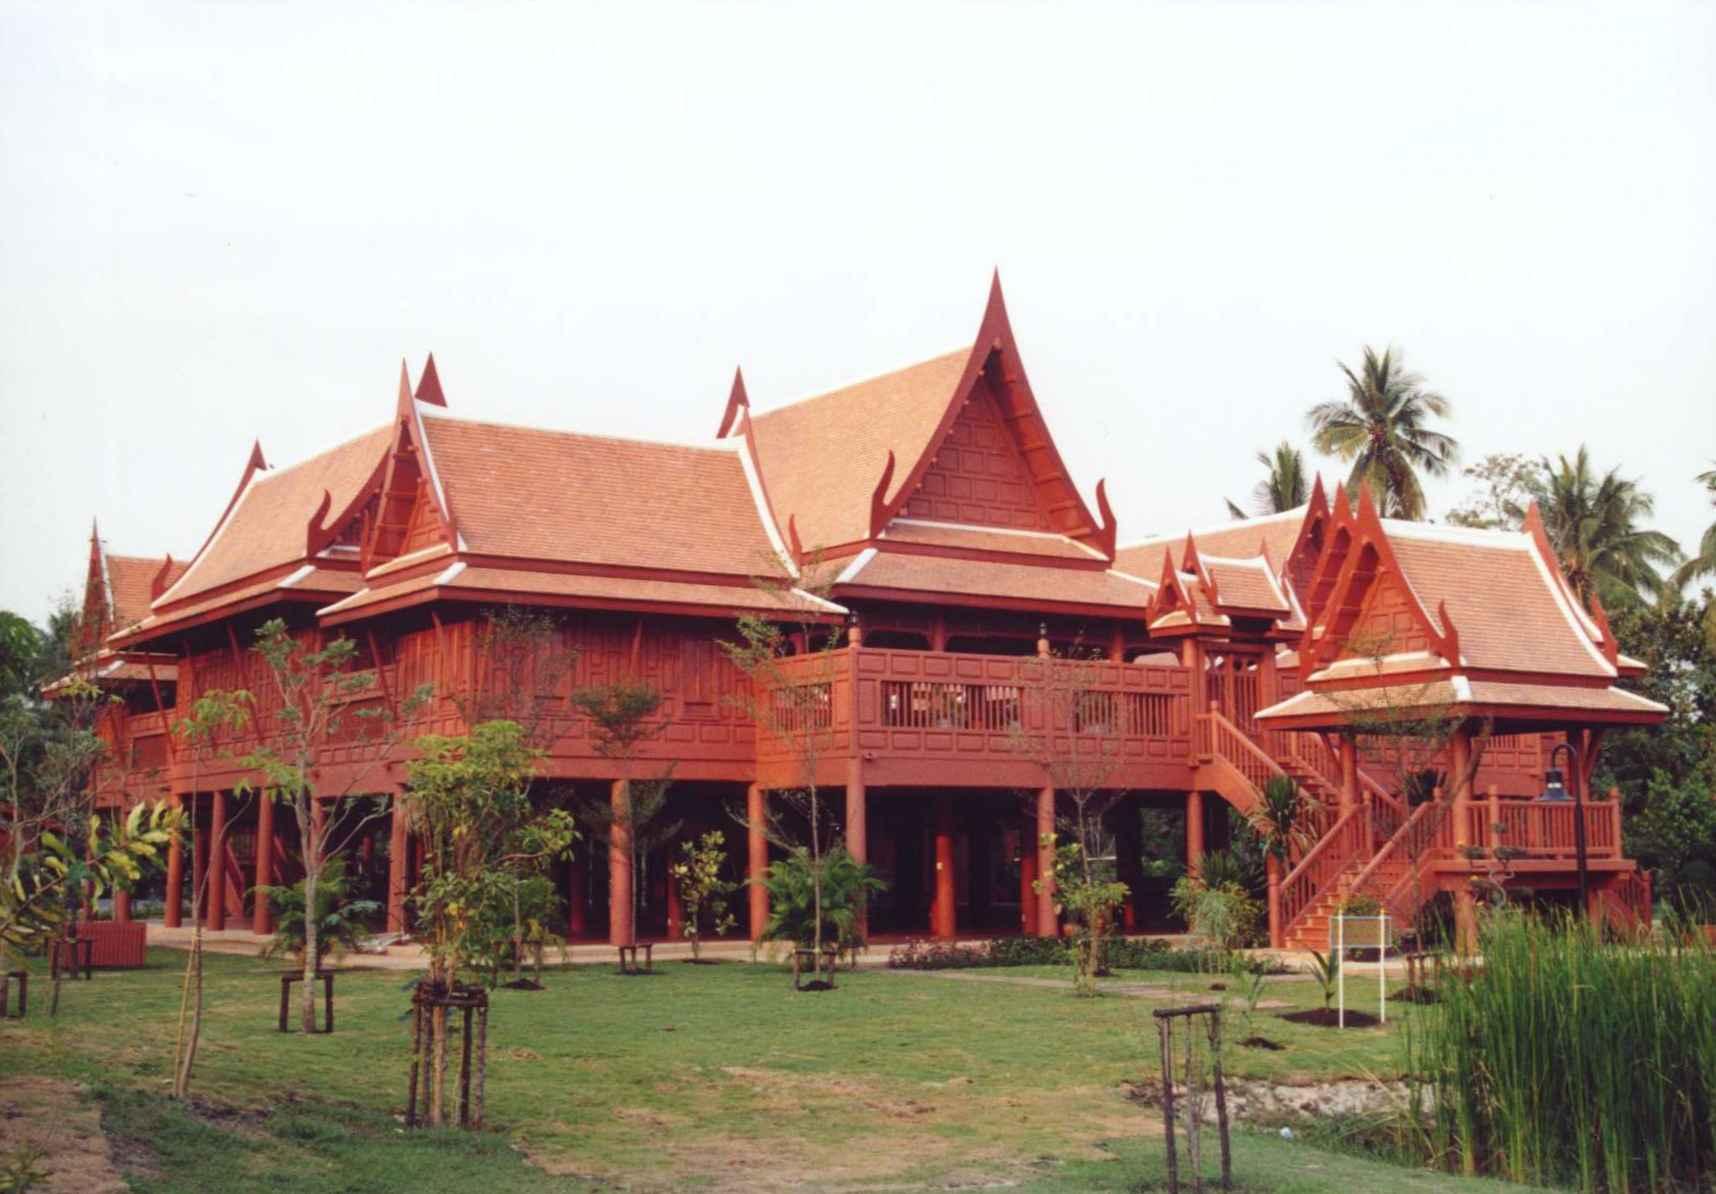 House design thailand - House Design Thailand 57